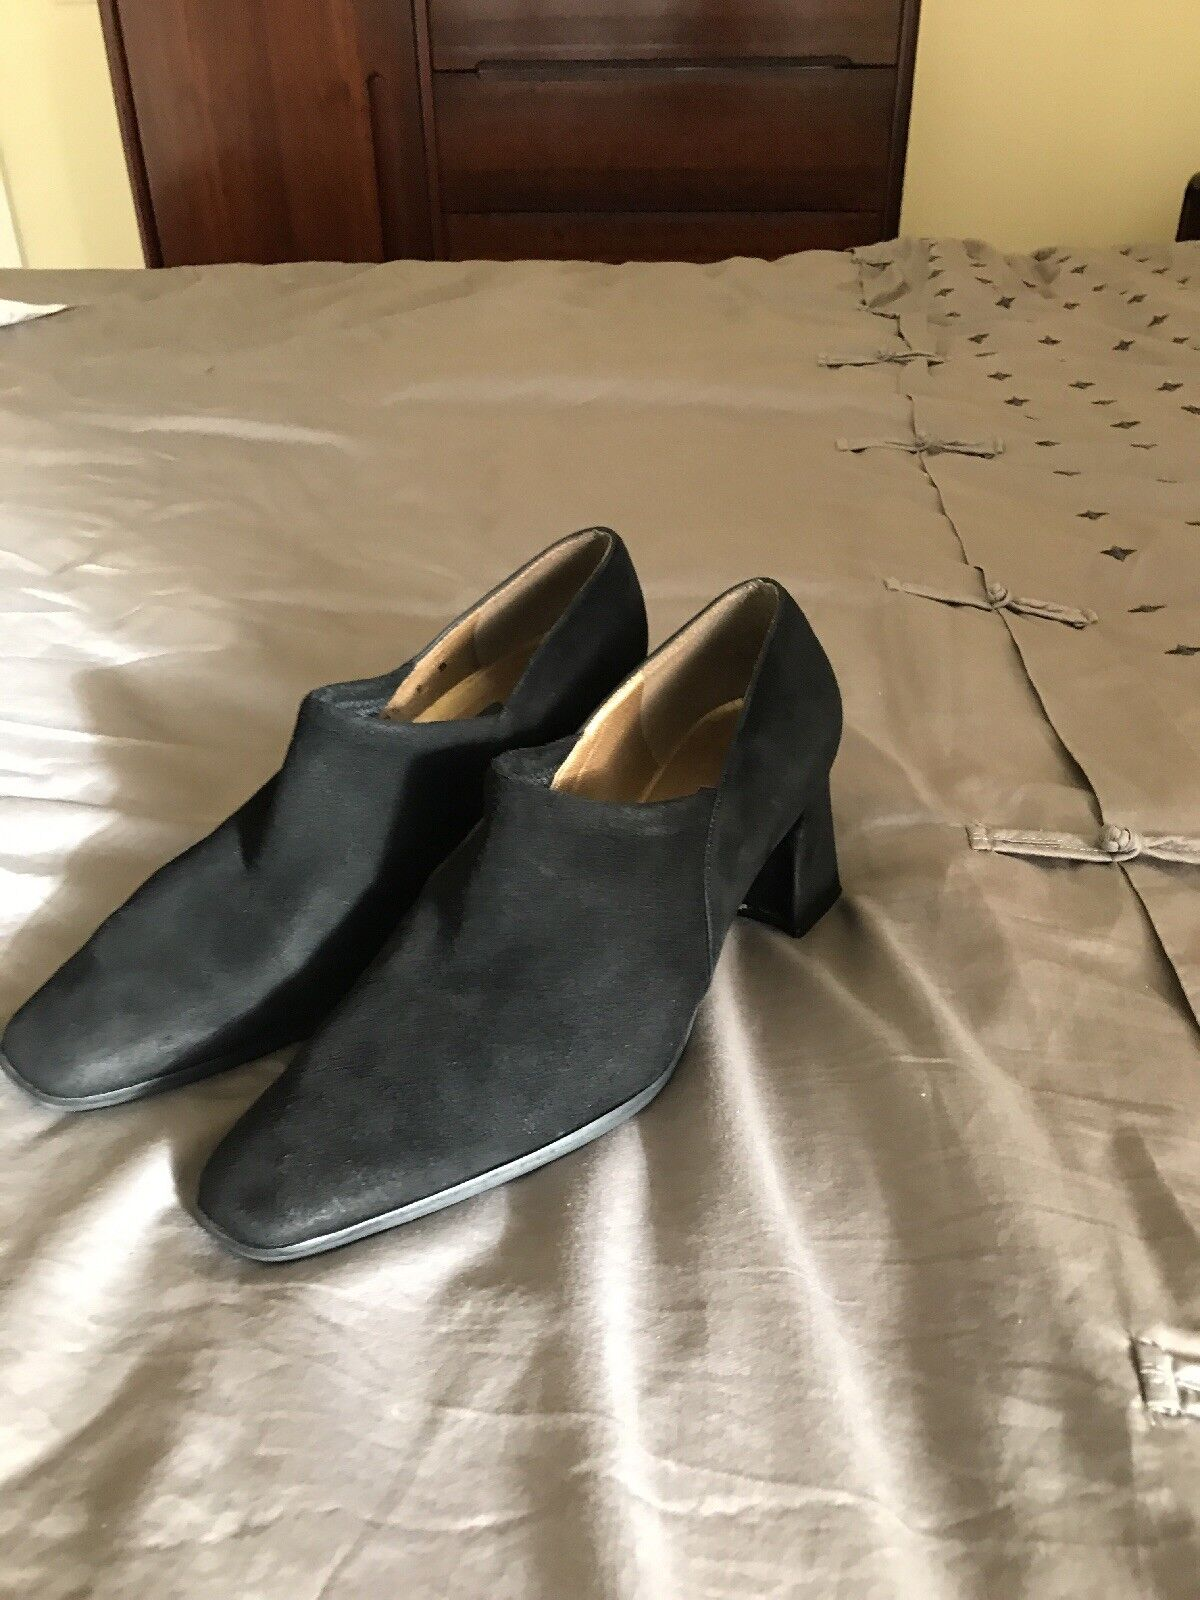 Stuart Weitzman Dimensione 9 B nero suede scarpe avvioies pumps, block heels EUC